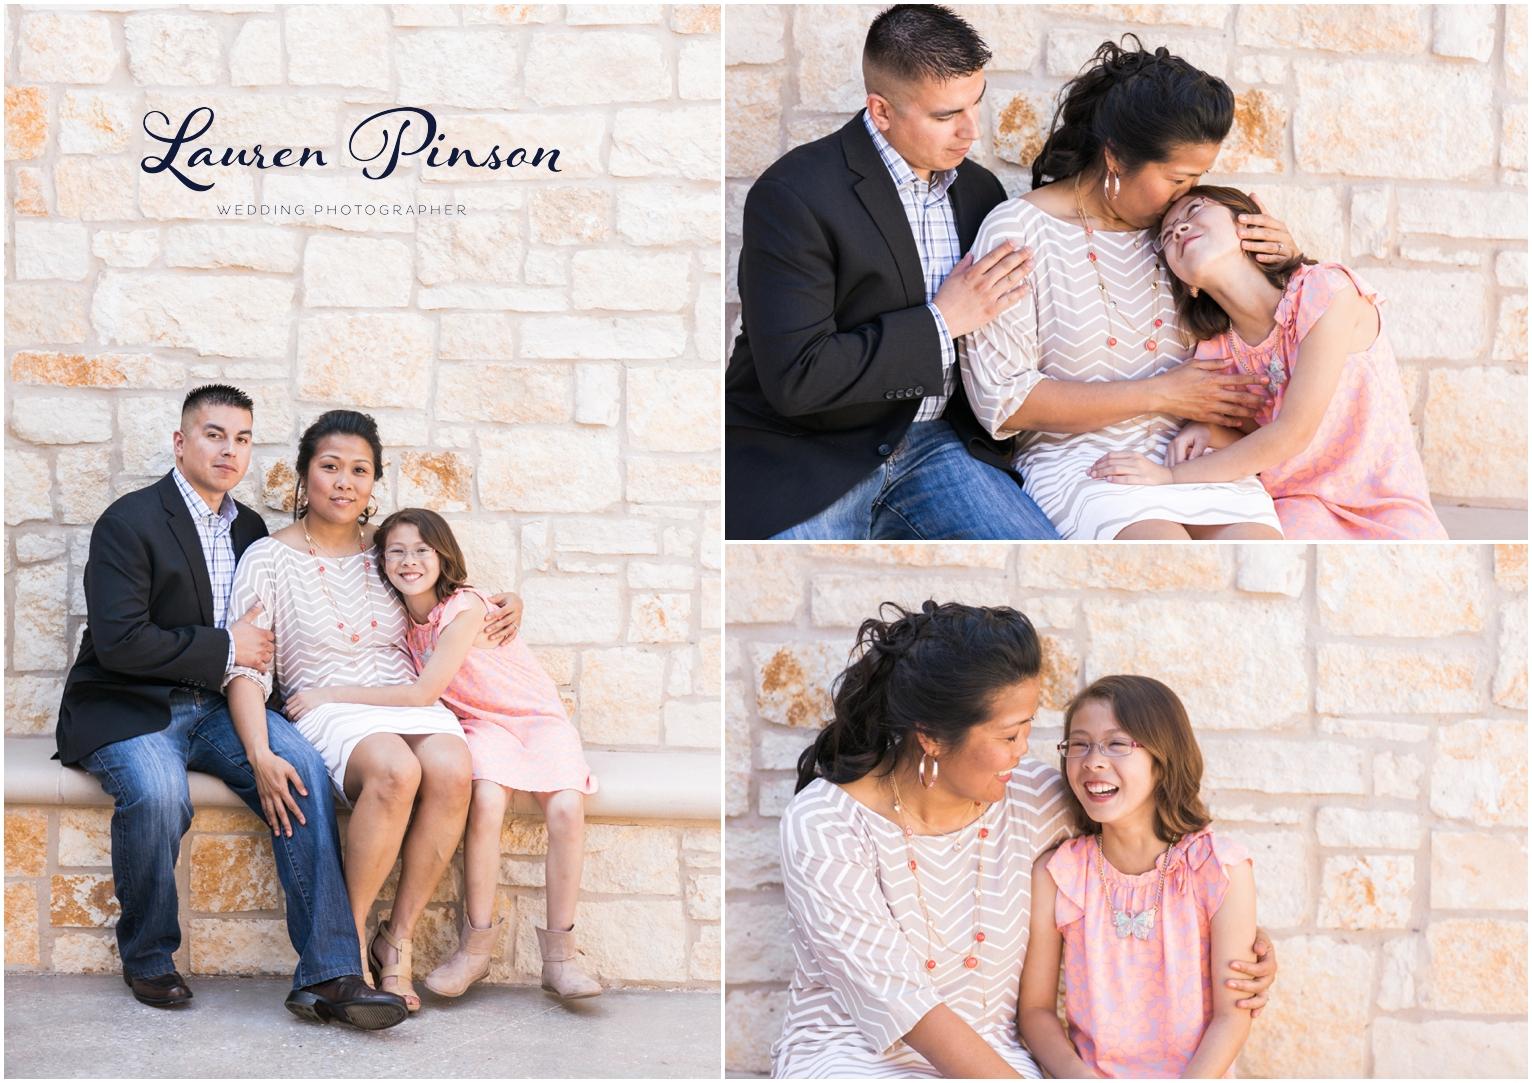 wichita-falls-wedding-photographer-engagement-session-texas-photography-oklahoma-engagement-wedding-photography_0604.jpg